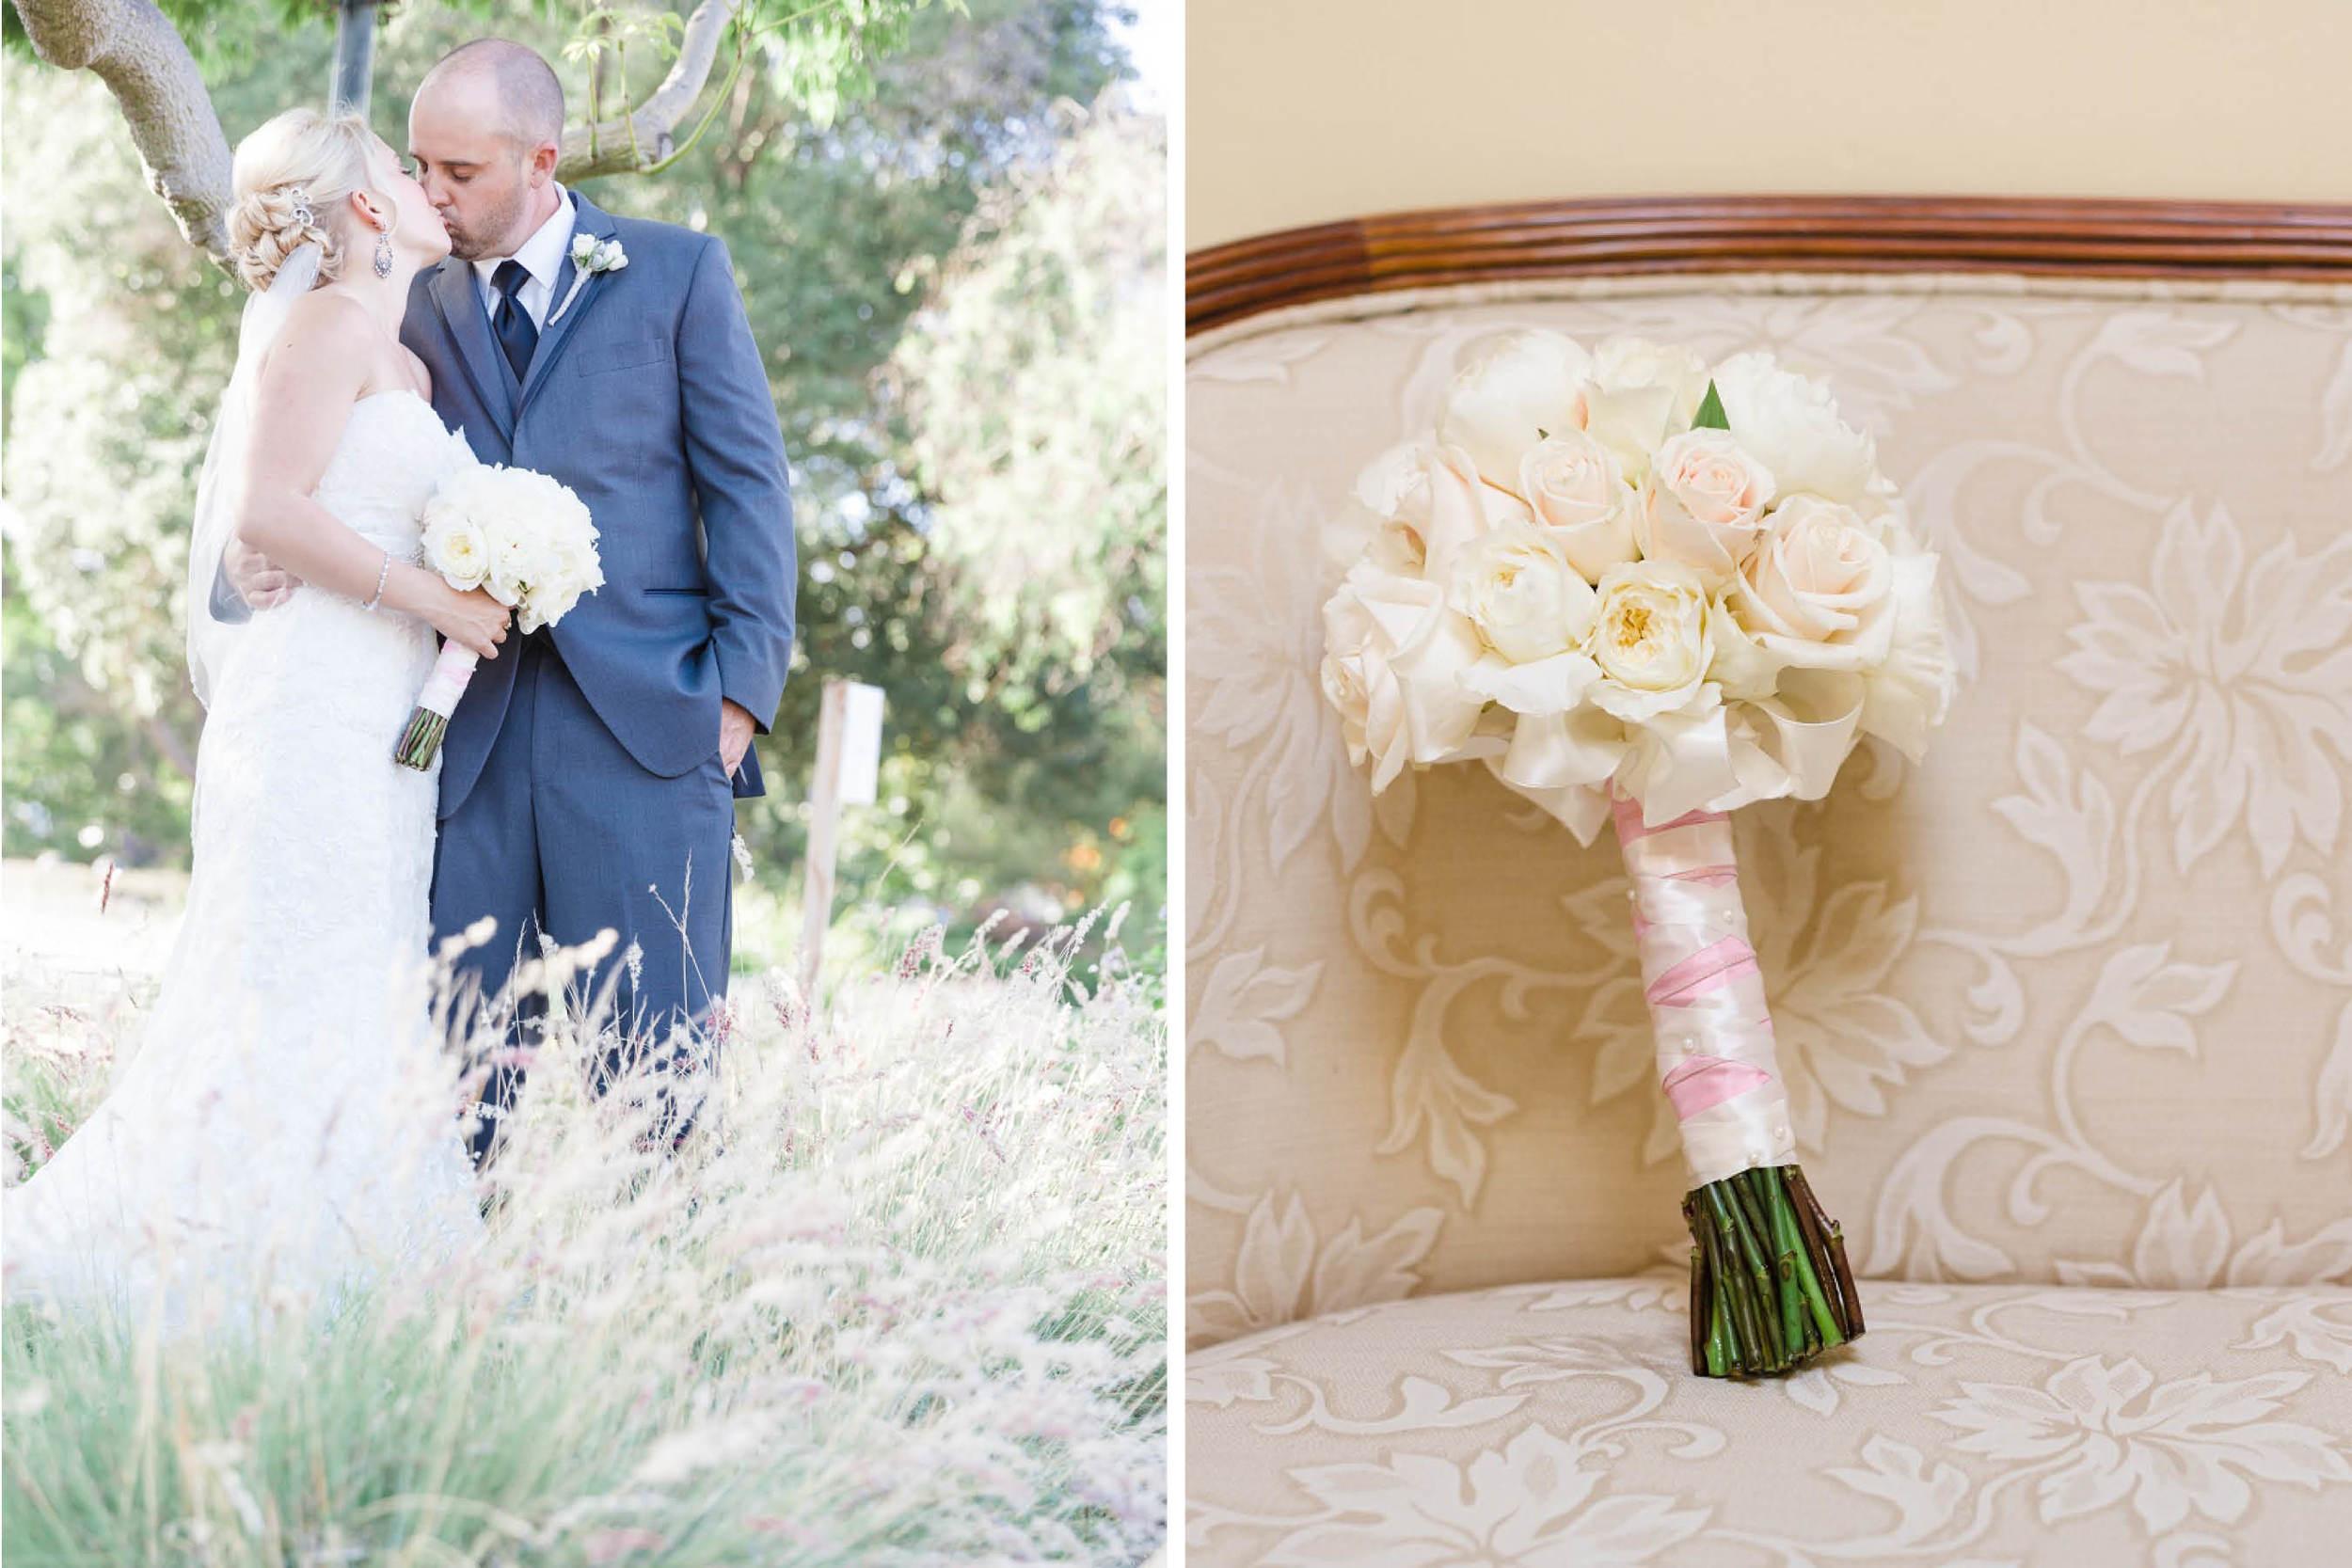 drew-derek-wedding (4).jpg